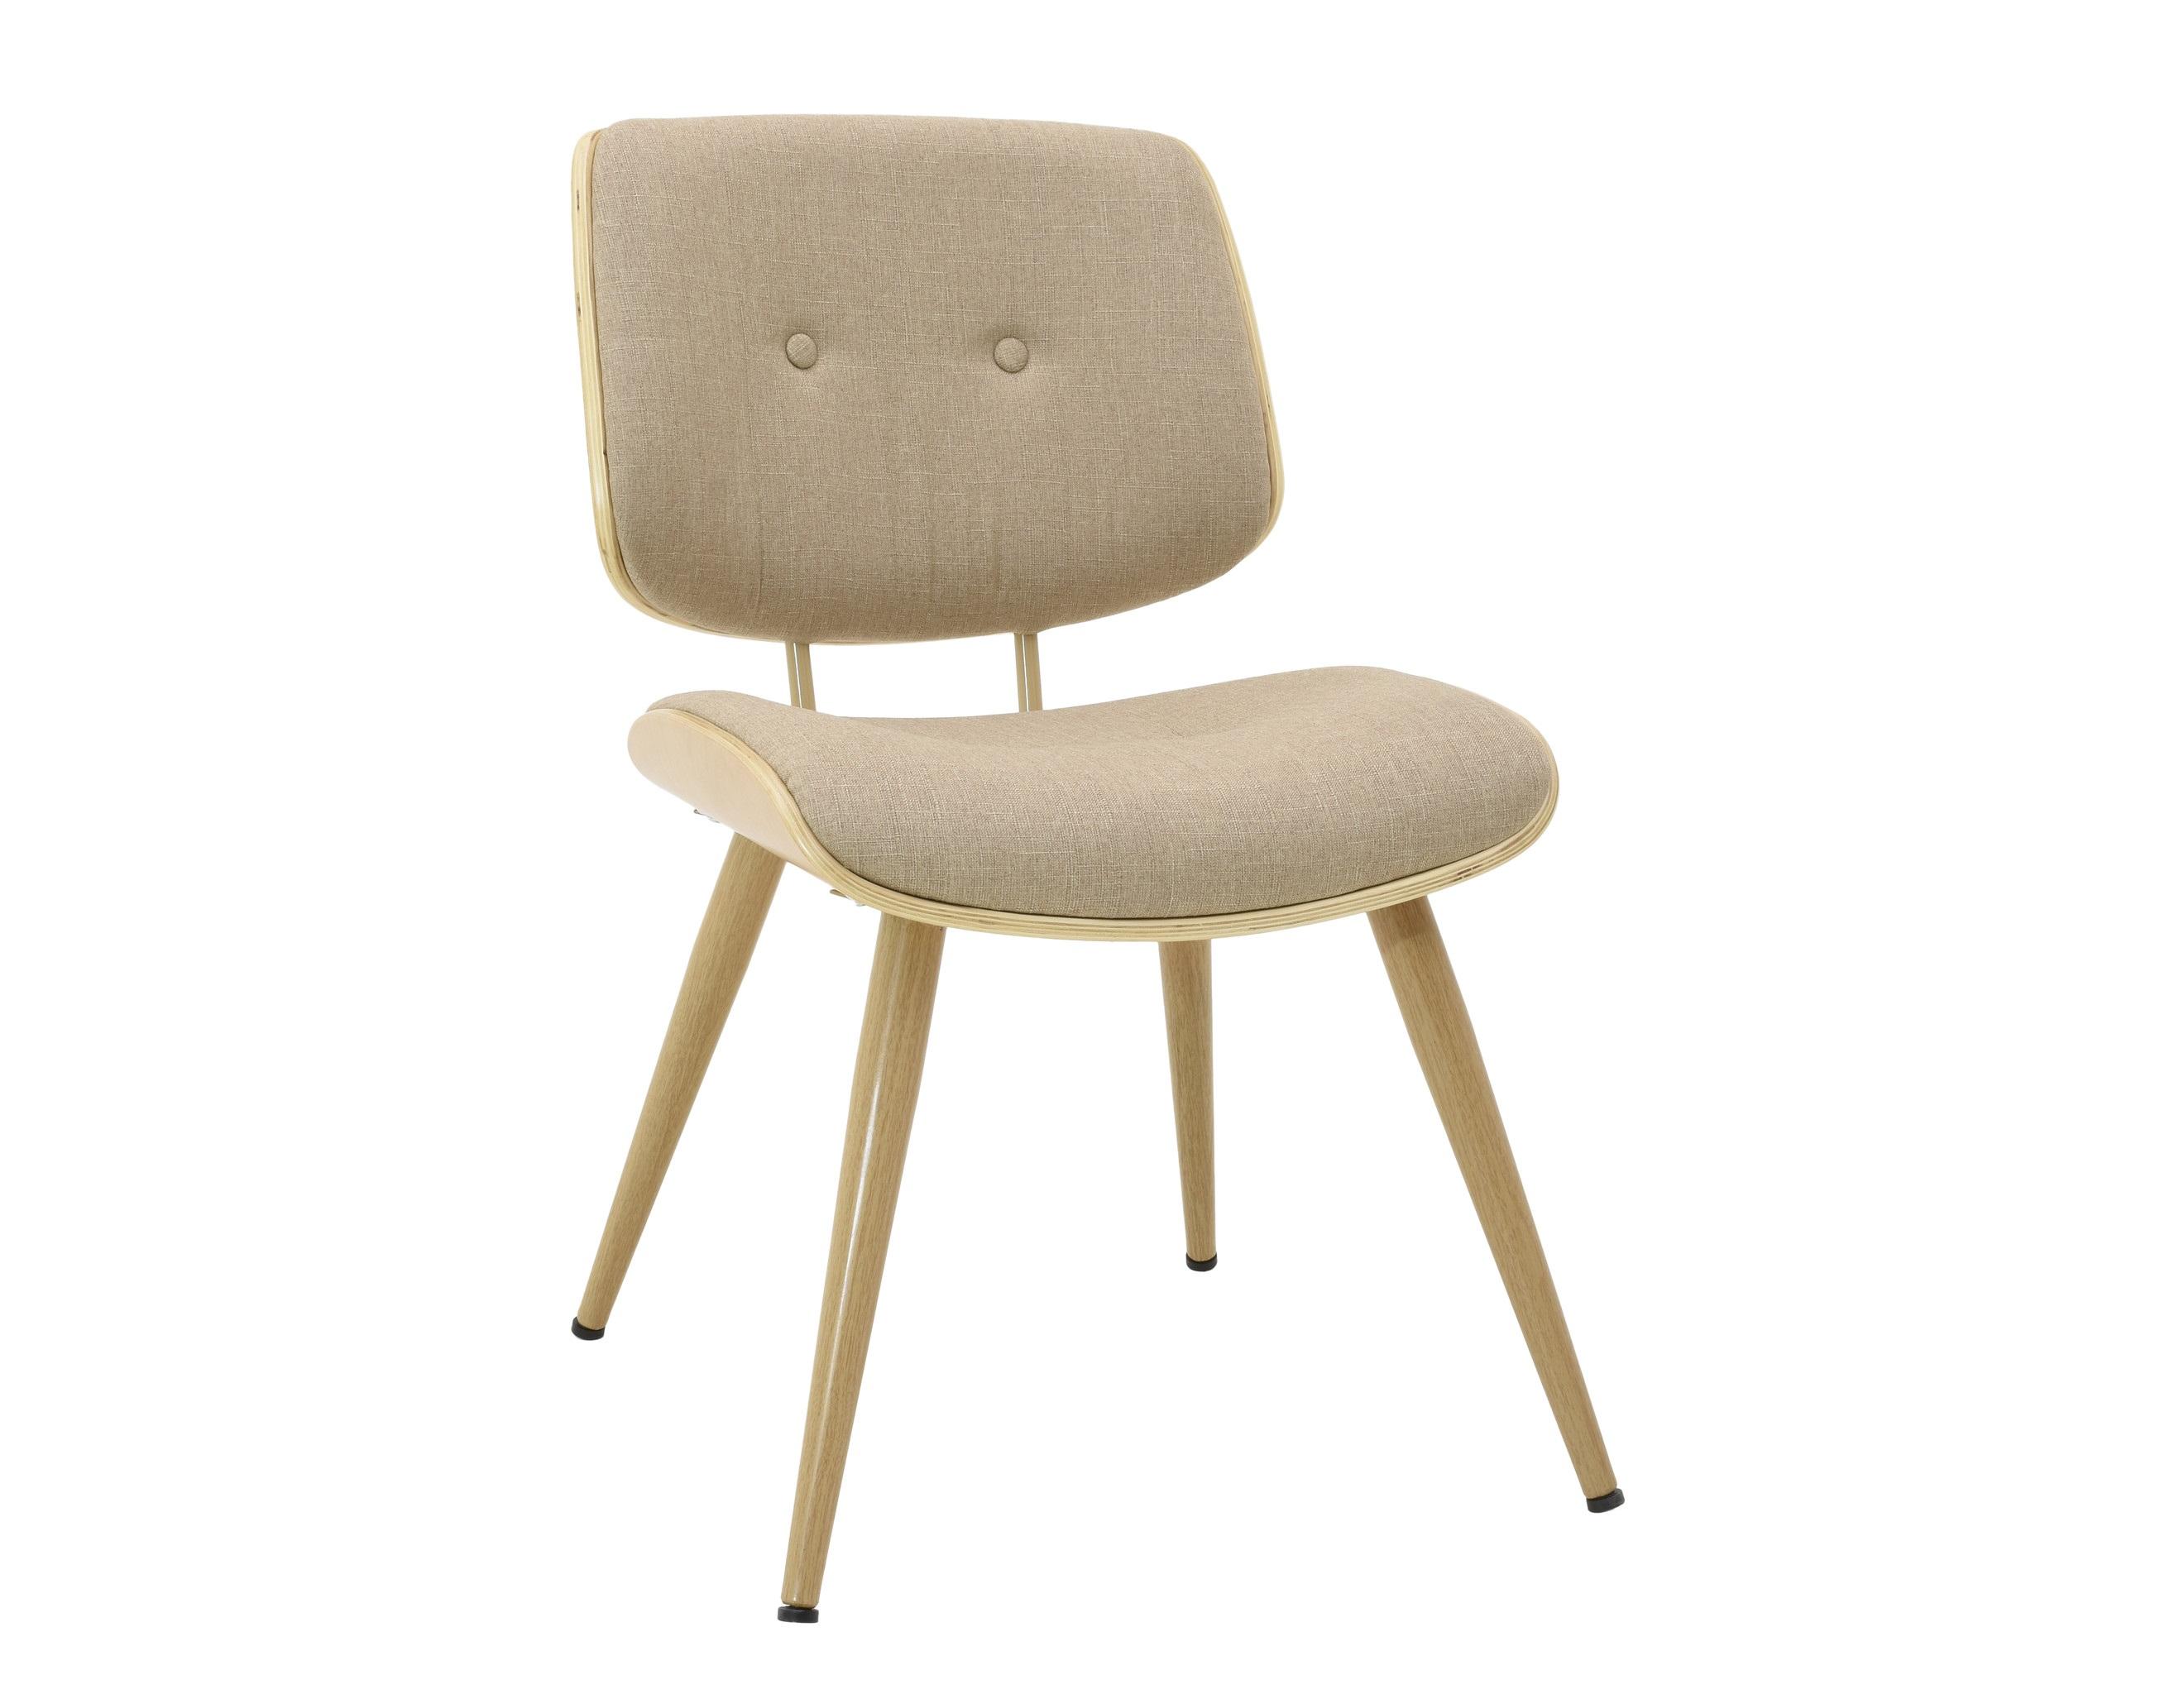 Кухонный стул To4rooms 15441556 от thefurnish